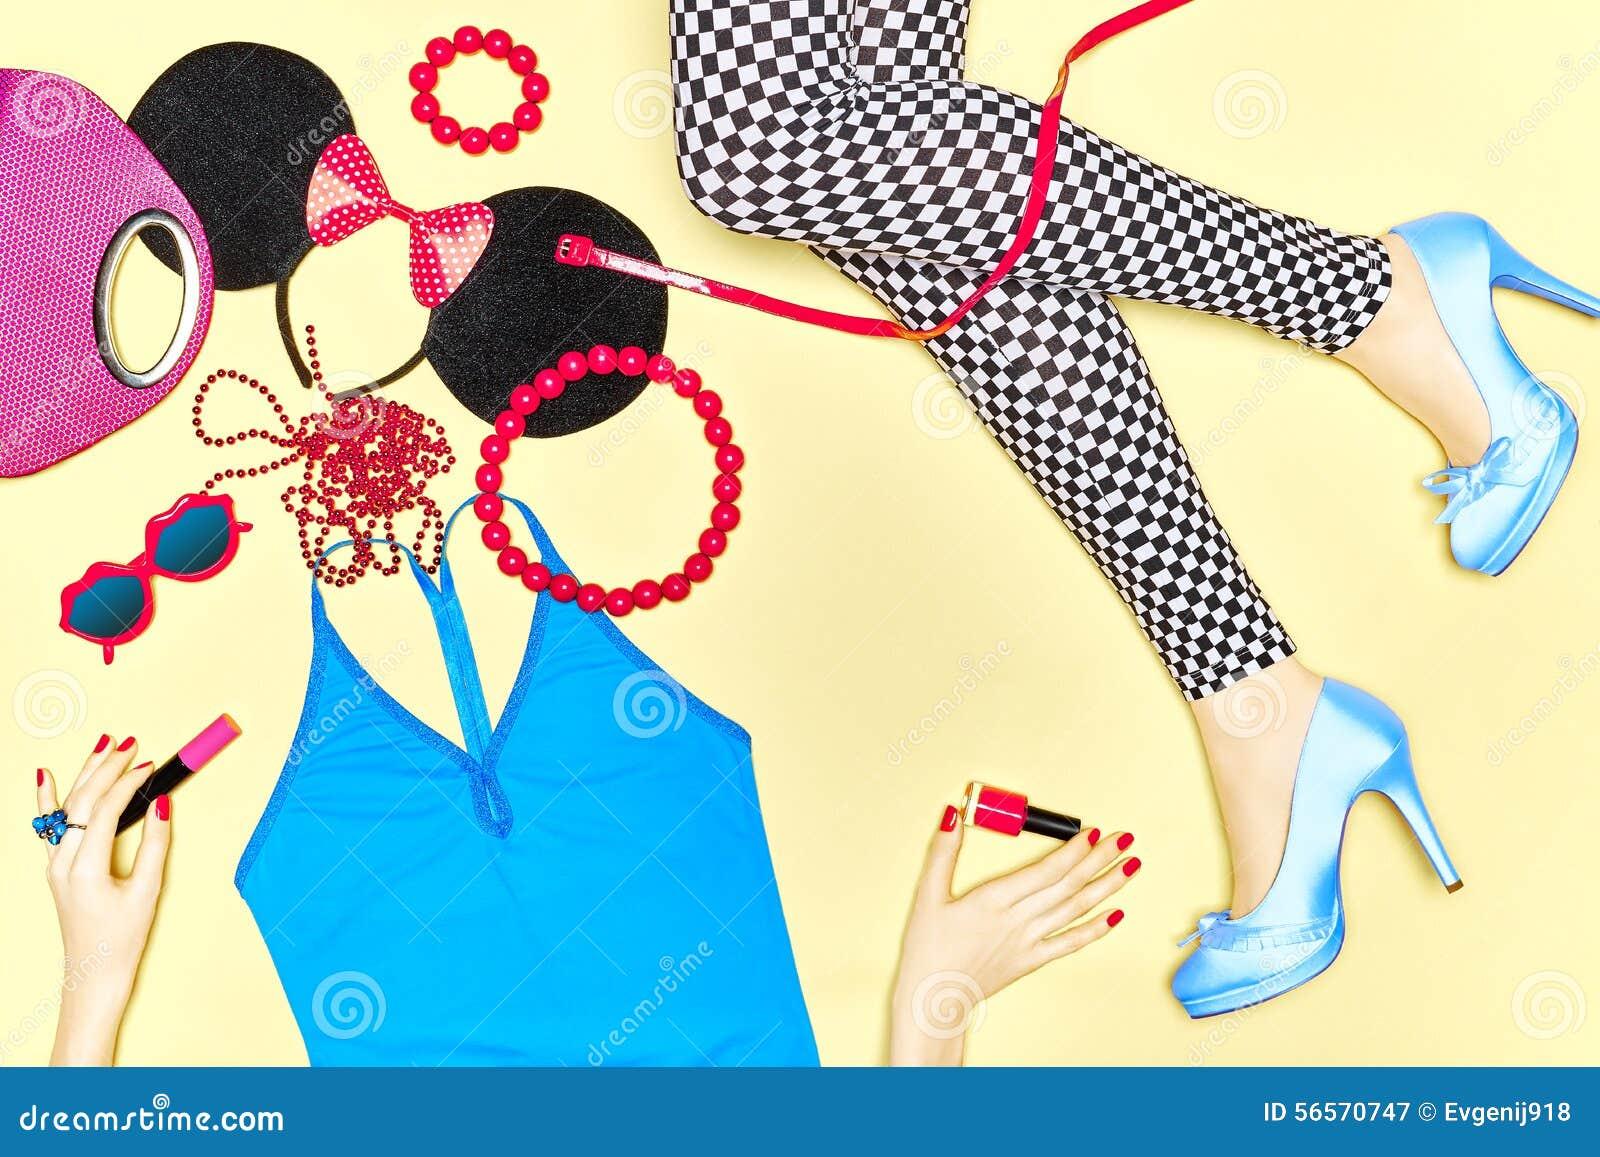 Download Προκλητικά λεπτά πόδια γυναίκας με το σύνολο μοντέρνου Στοκ Εικόνα - εικόνα από πολυτέλεια, προκλητικός: 56570747